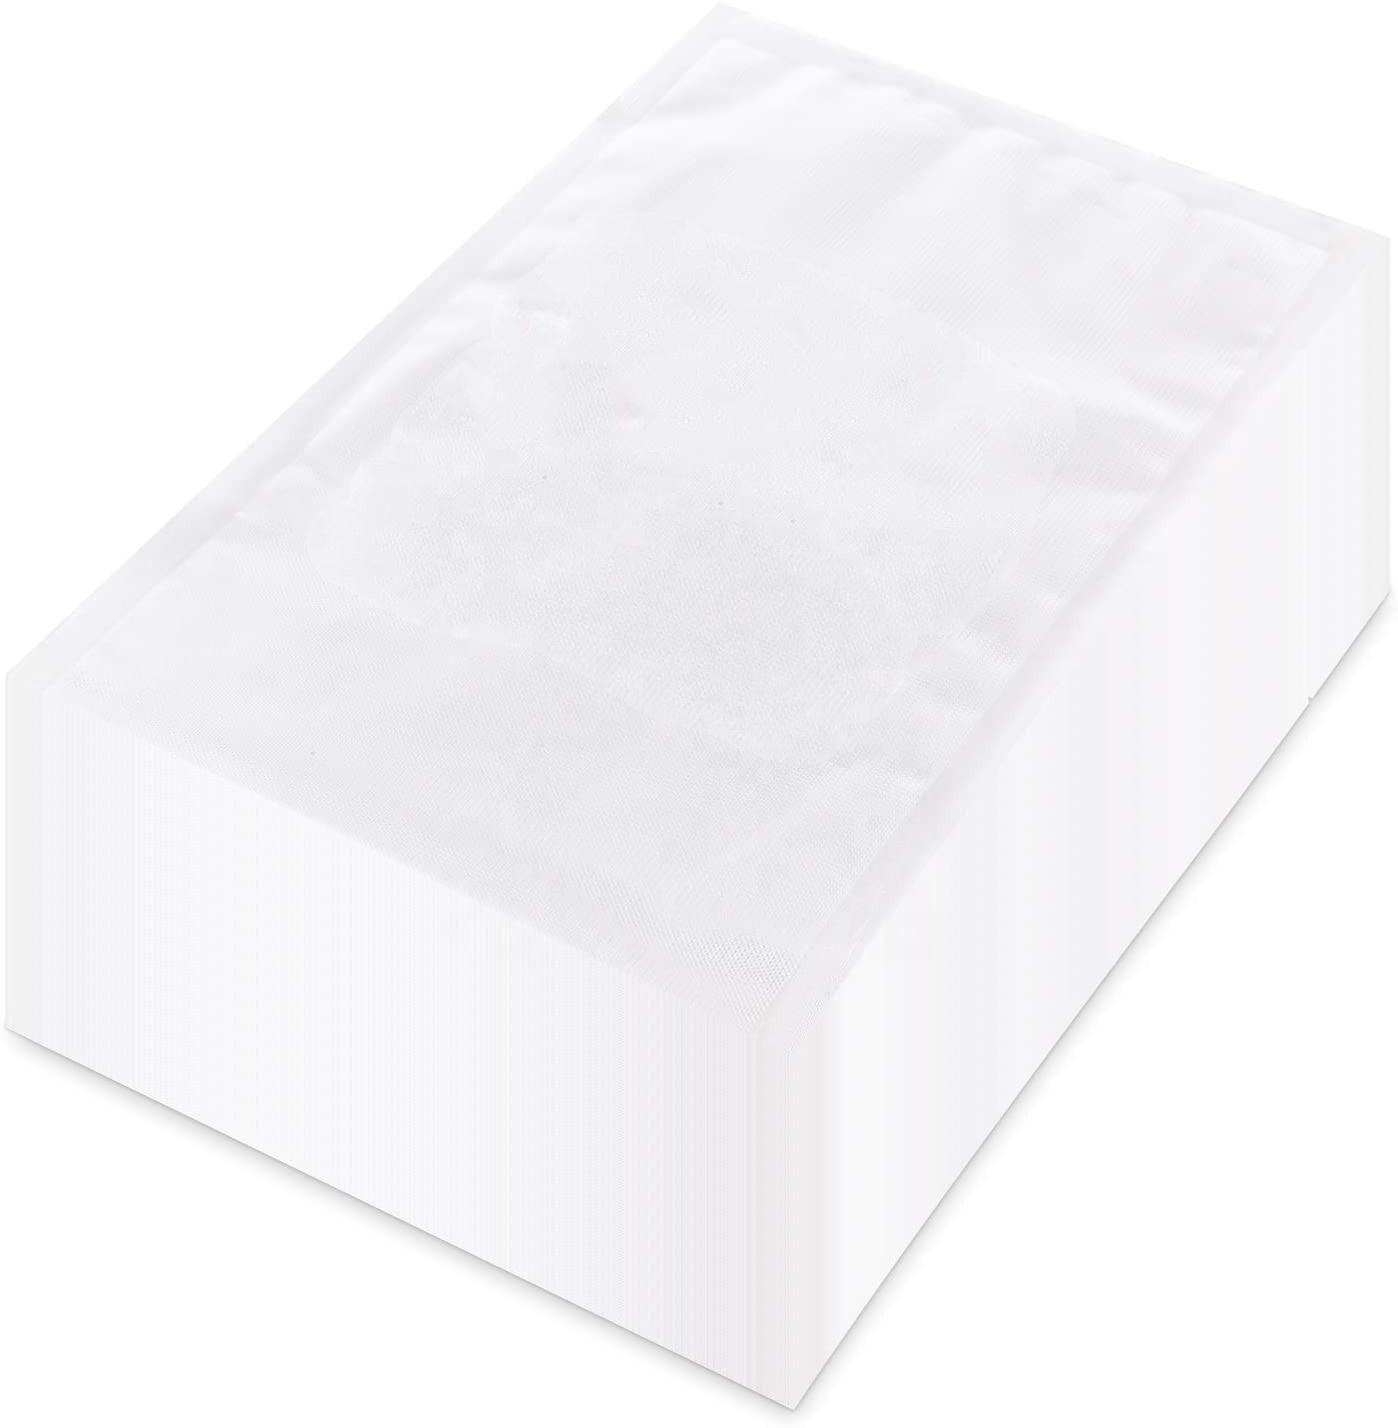 BPA Free Heavy Duty Sous Vide Vaccume Seal Precut Bag Eco Vacuum Sealer Bags